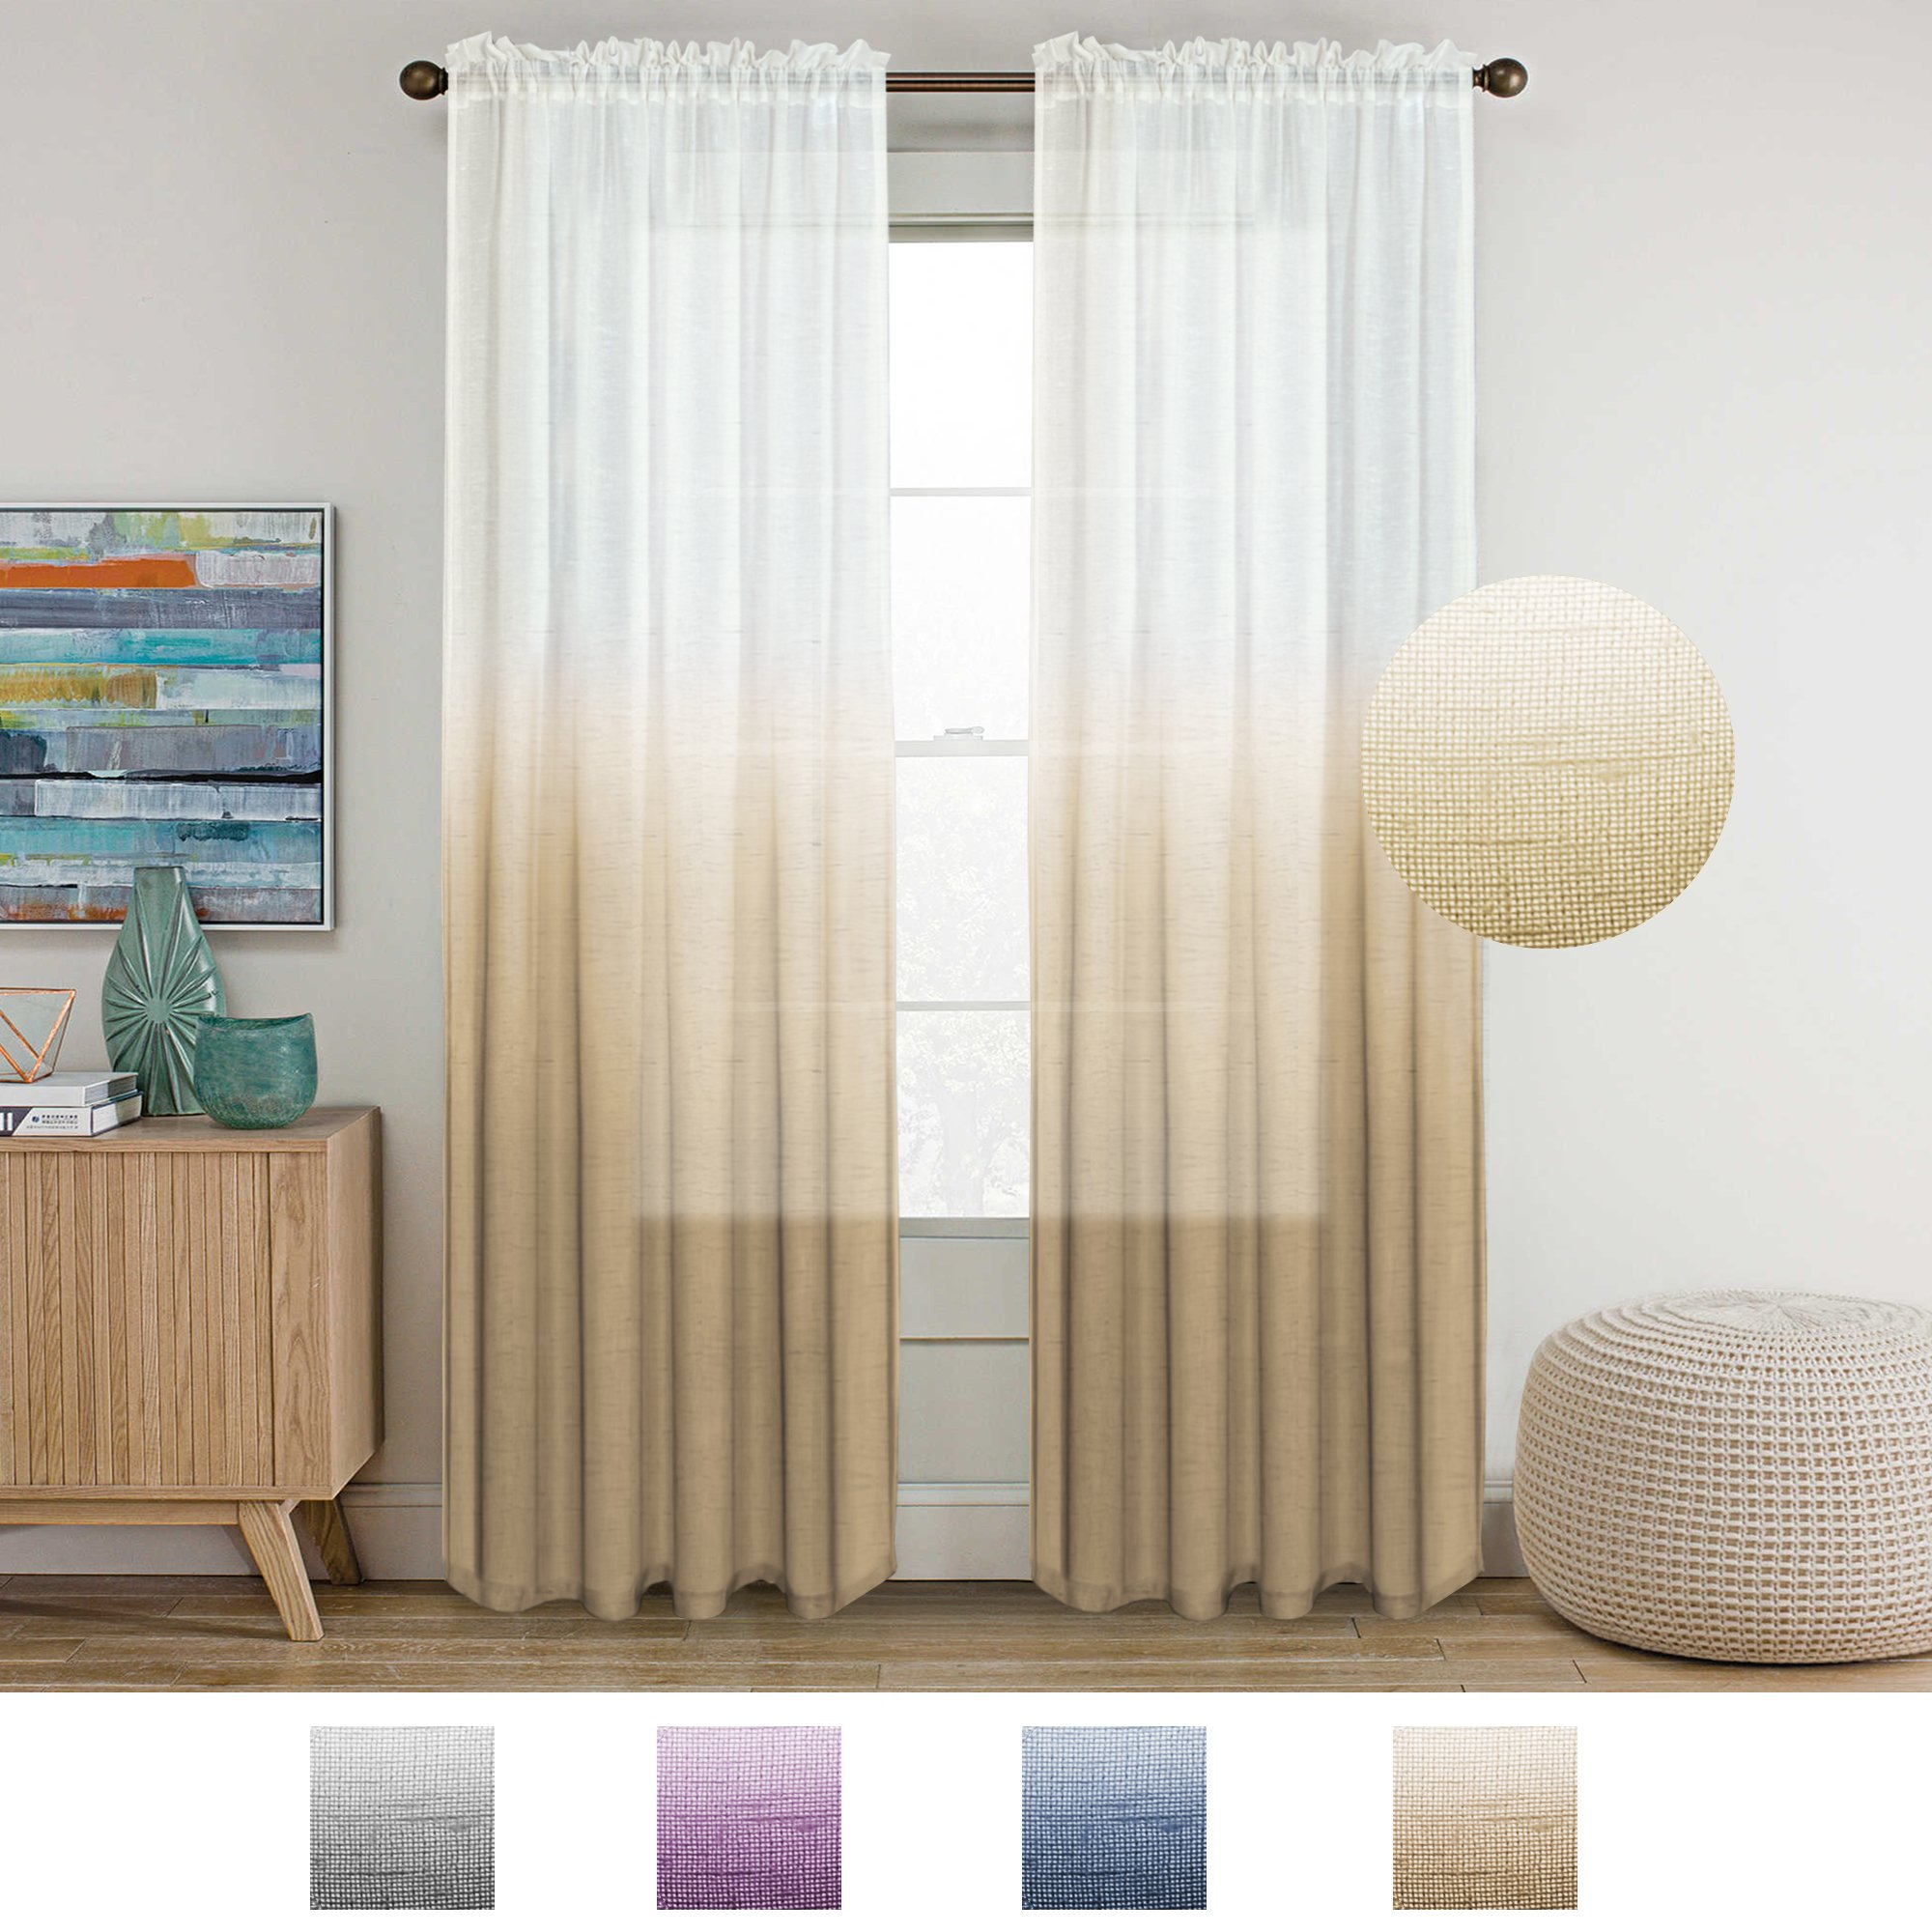 Cheap Natural Linen Sheer Curtains Find Natural Linen Sheer Curtains Deals On Line At Alibaba Com